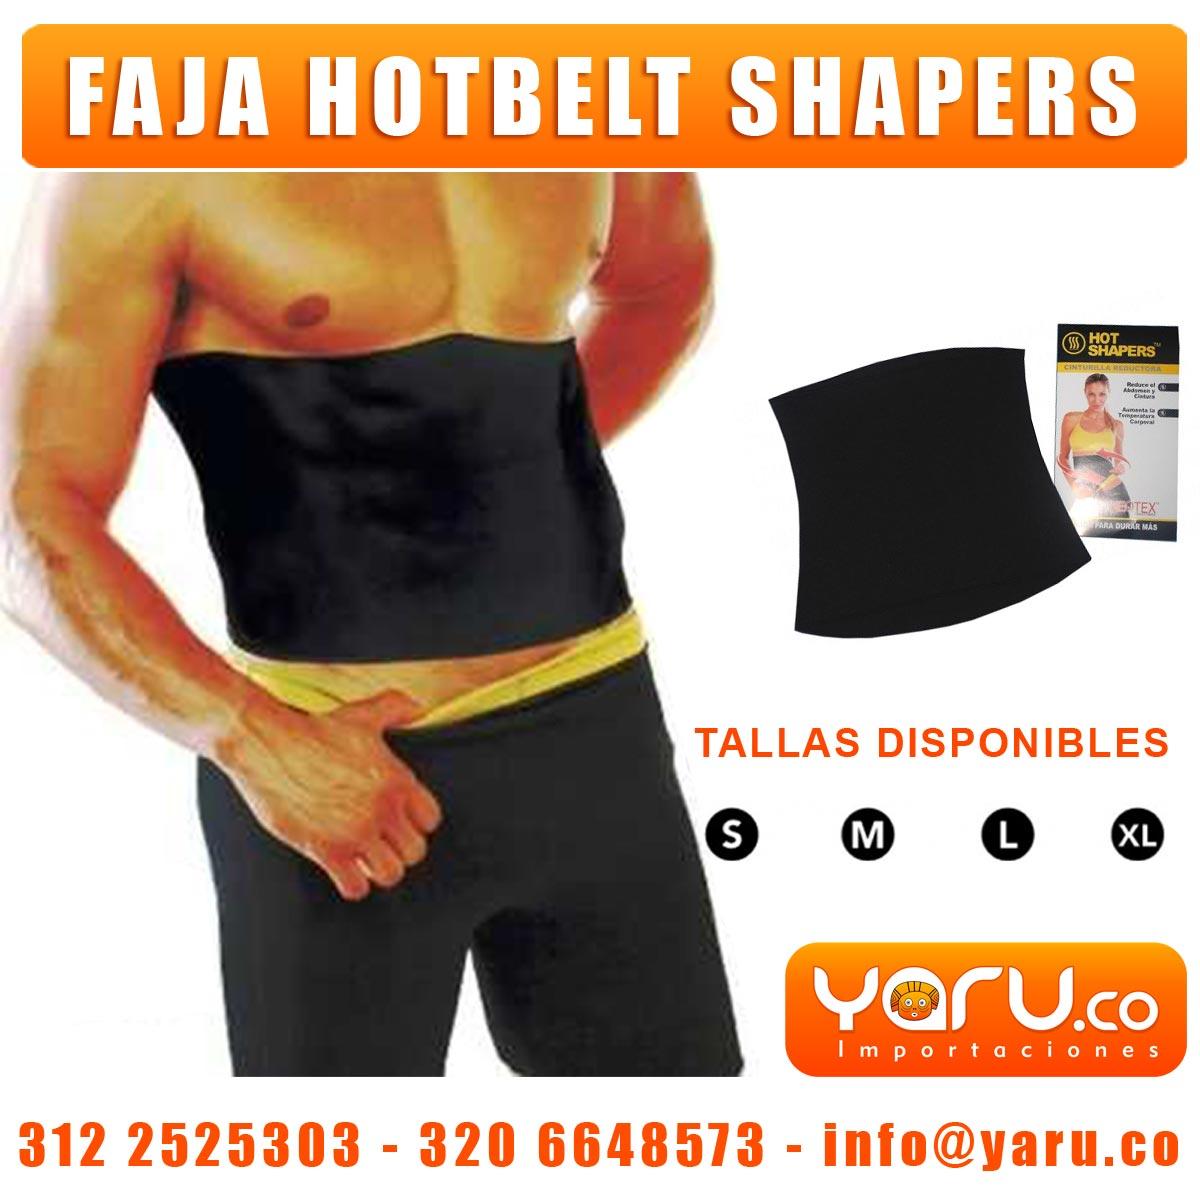 faja-reductora-cinturilla-hot-belt-ayuda-sudar-adelgaza-reduce-tallas-yaru-importaciones-olx(1)